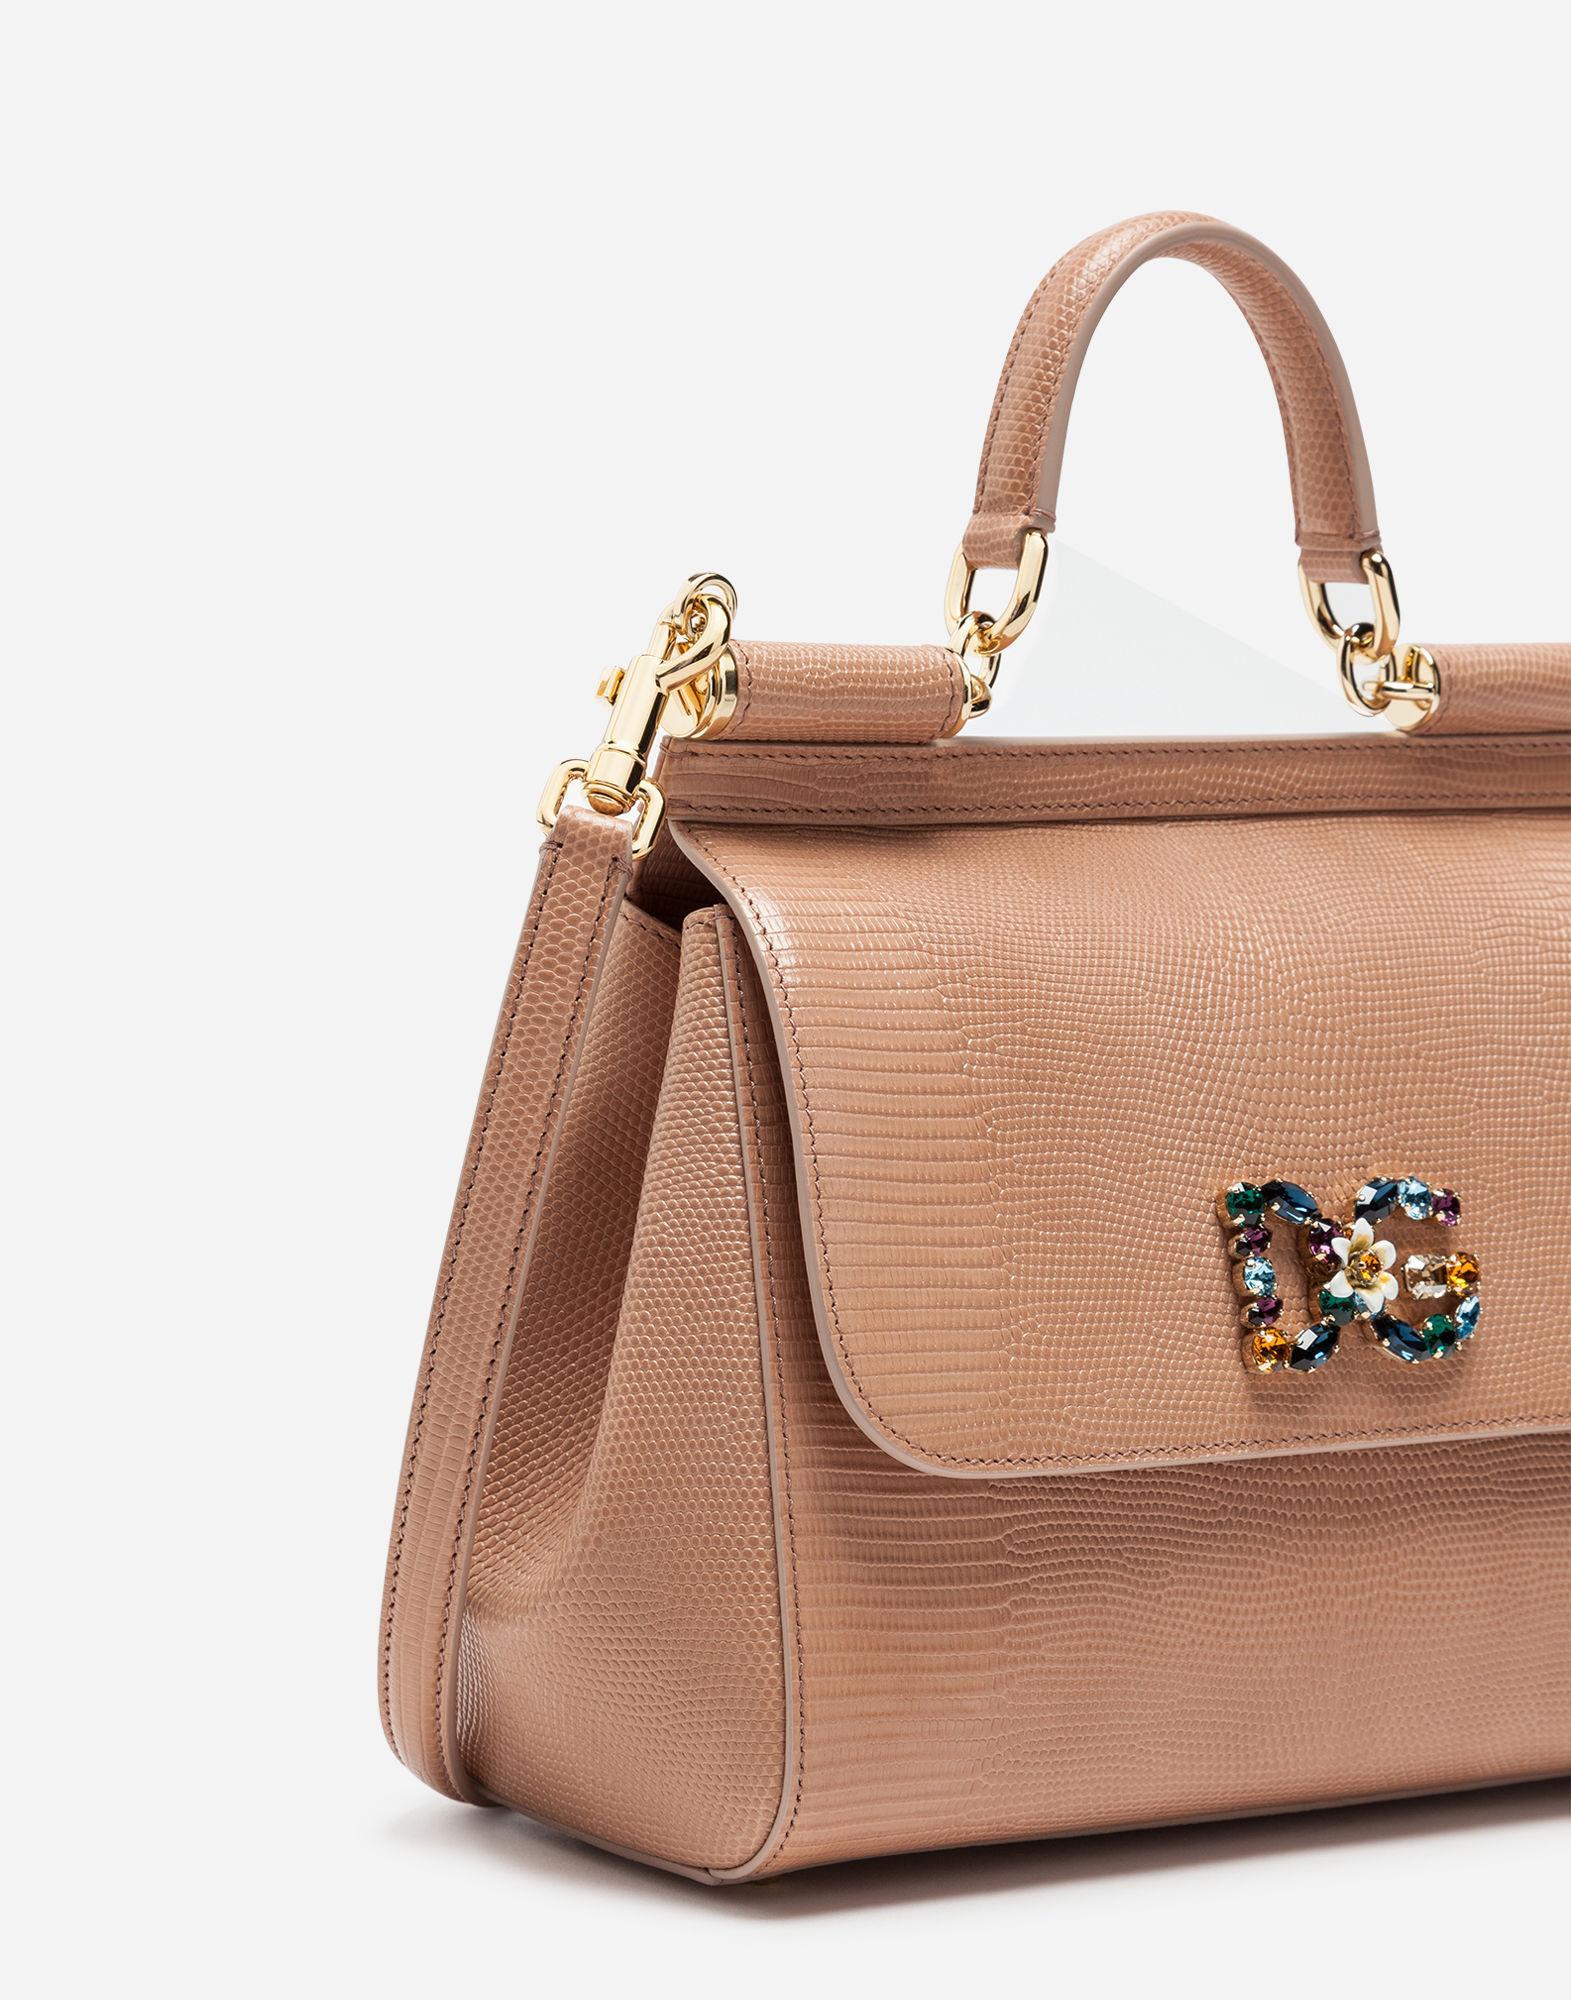 577f7338996c Dolce   Gabbana Medium Calfskin Sicily Bag With Iguana Print And Dg Crystal  Logo Patch In